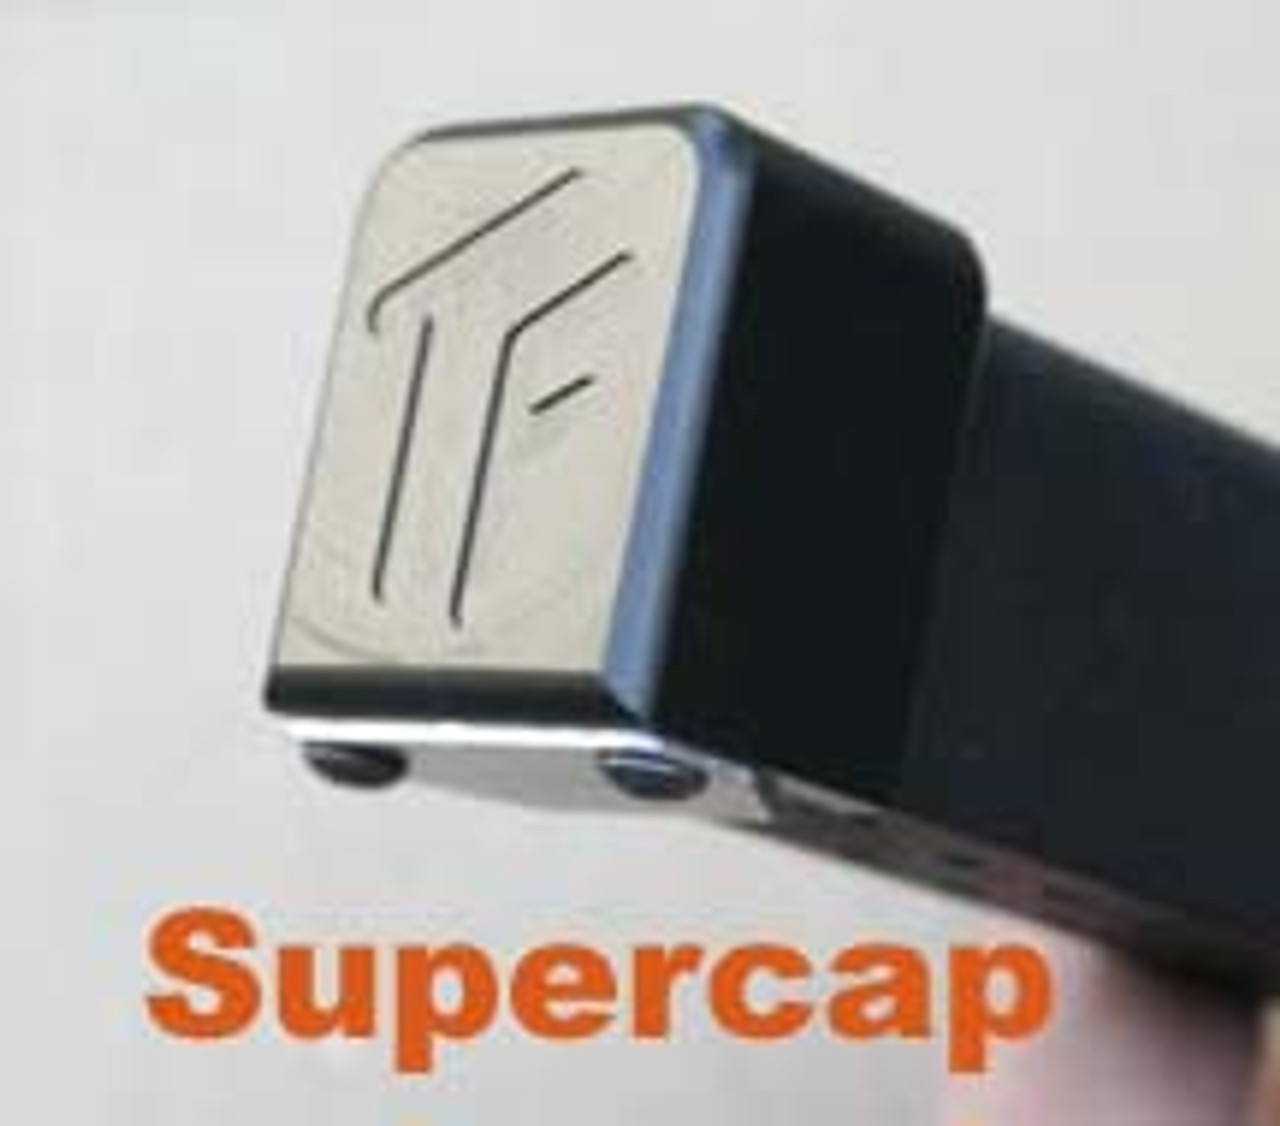 Glock Supercap +3 - Delrin